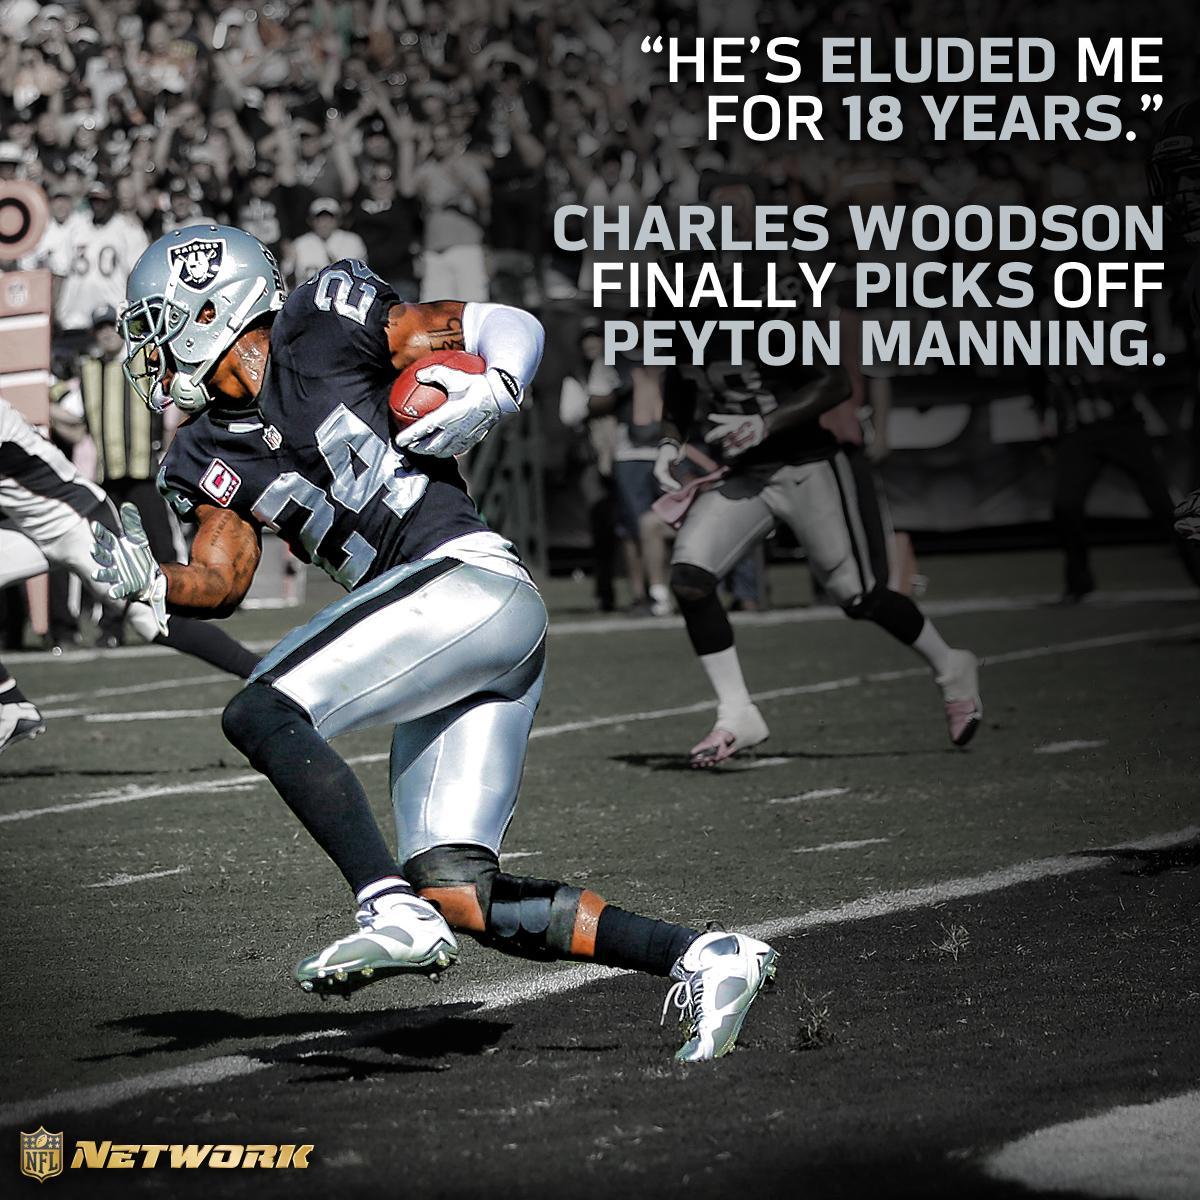 He wanted it. And he got it. http://t.co/Na2qyx1wL9